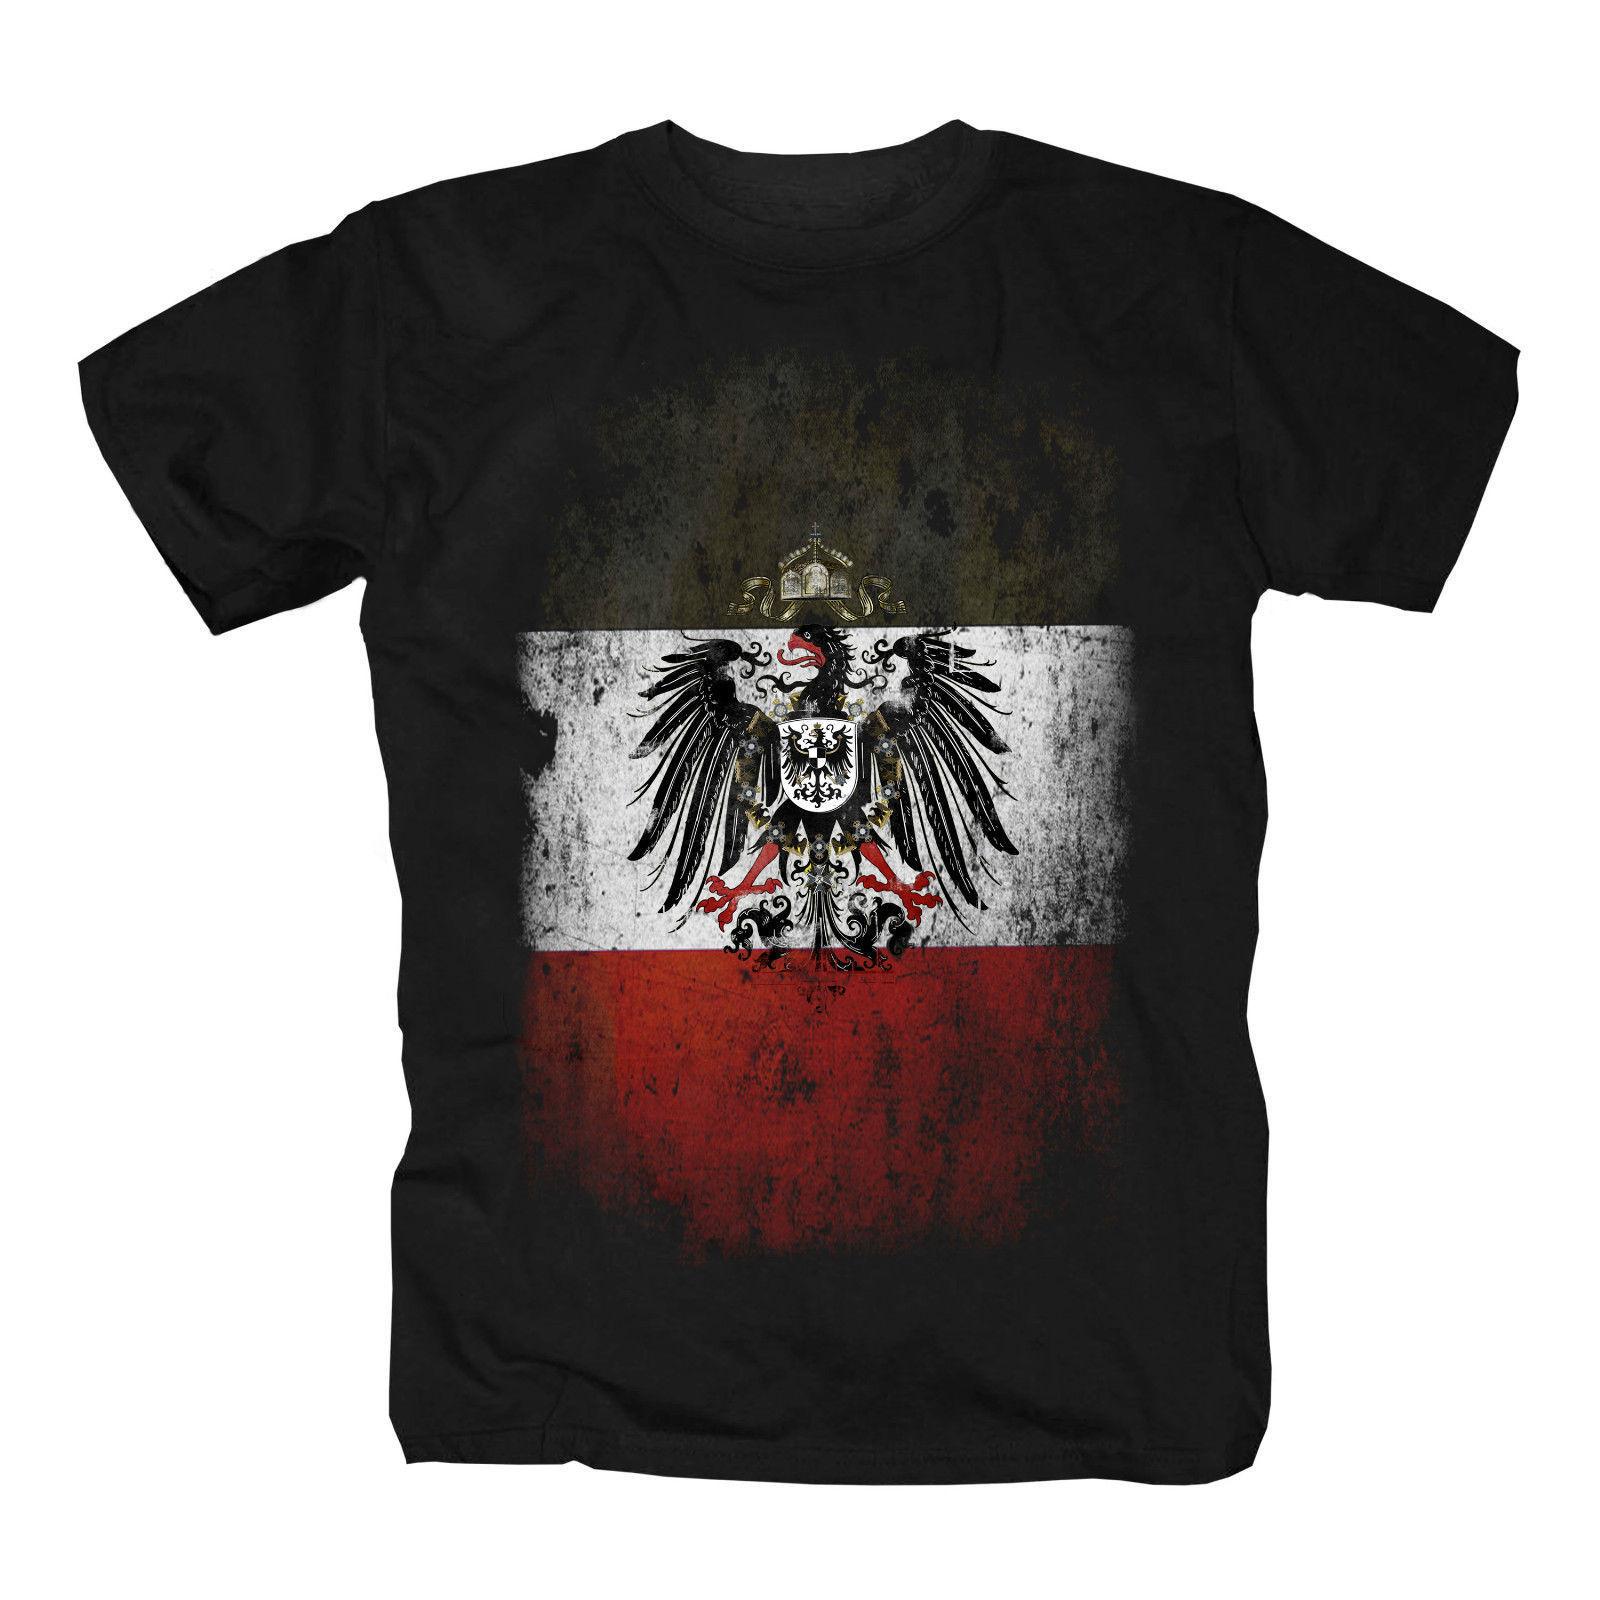 Impresso Tees Harajuku Masculino Top Roupas de Fitness Da Marca T-shirt Camisa Deutschland Adler Deutsches Reich Alemanha Fun Kult Tee Camisa